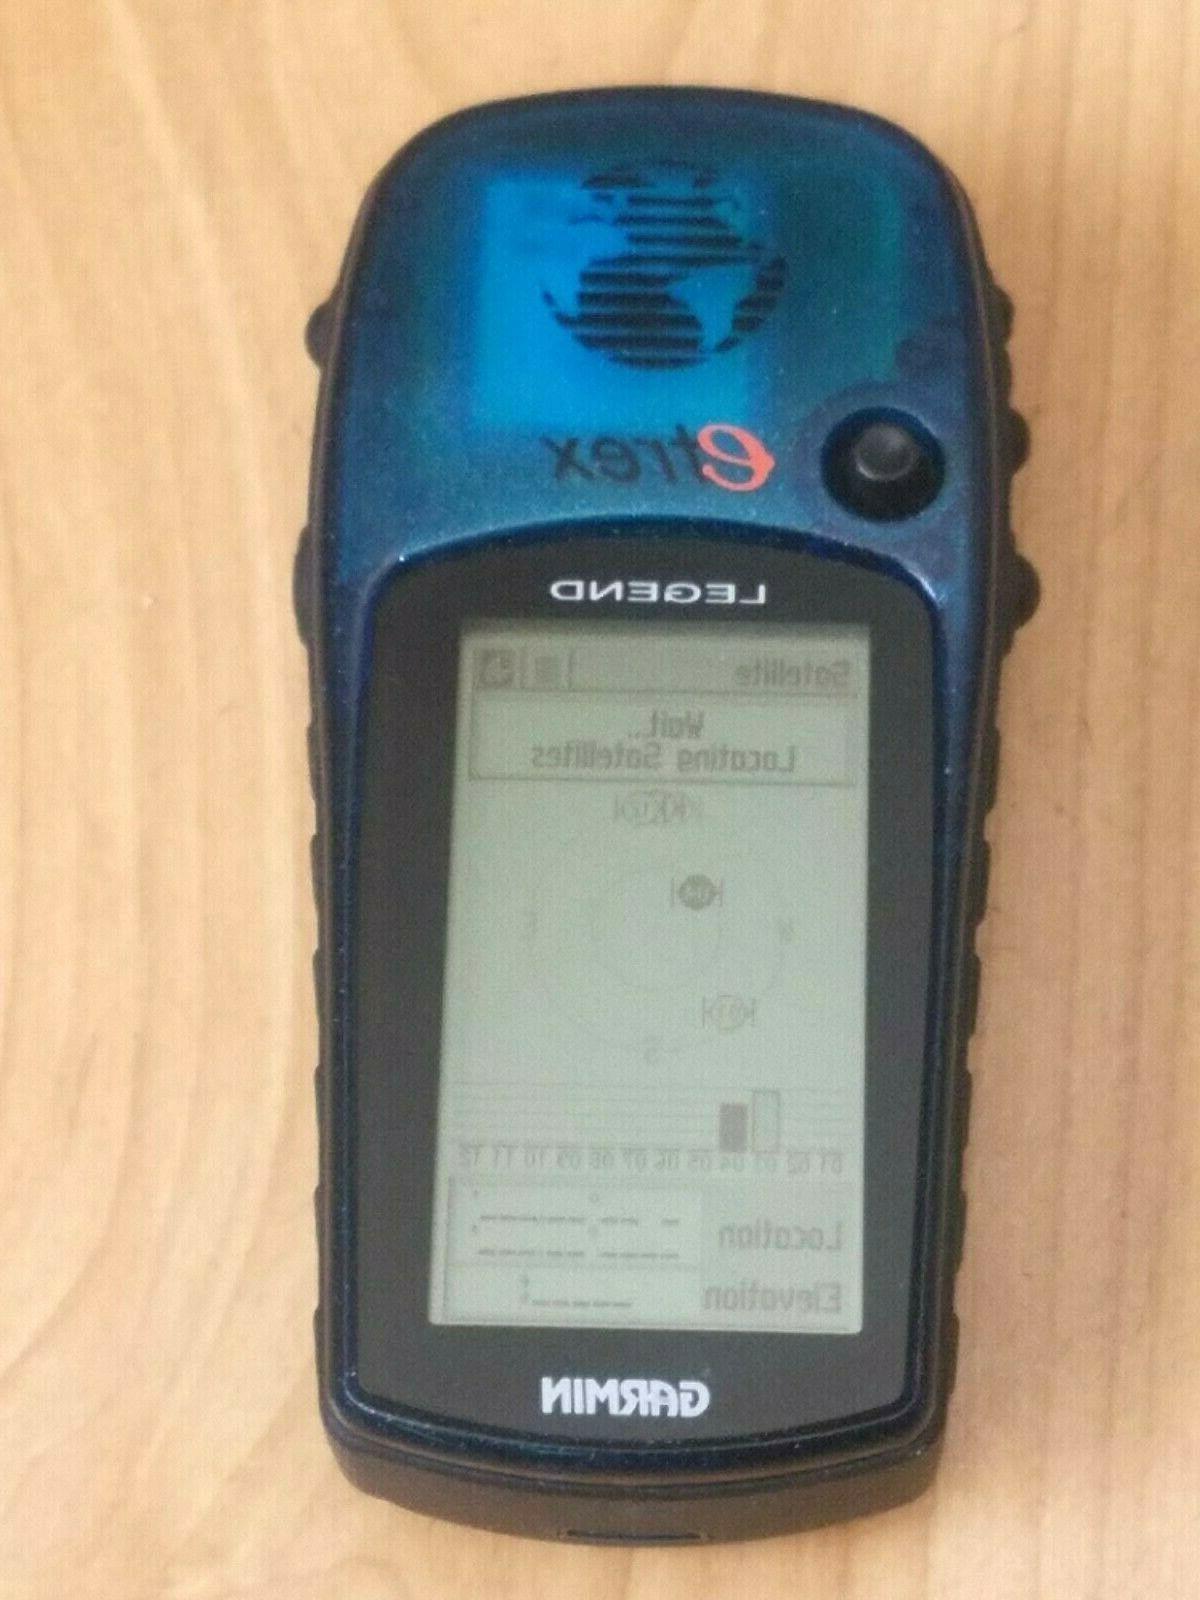 Garmin Legend Handheld Personal GPS Fishing